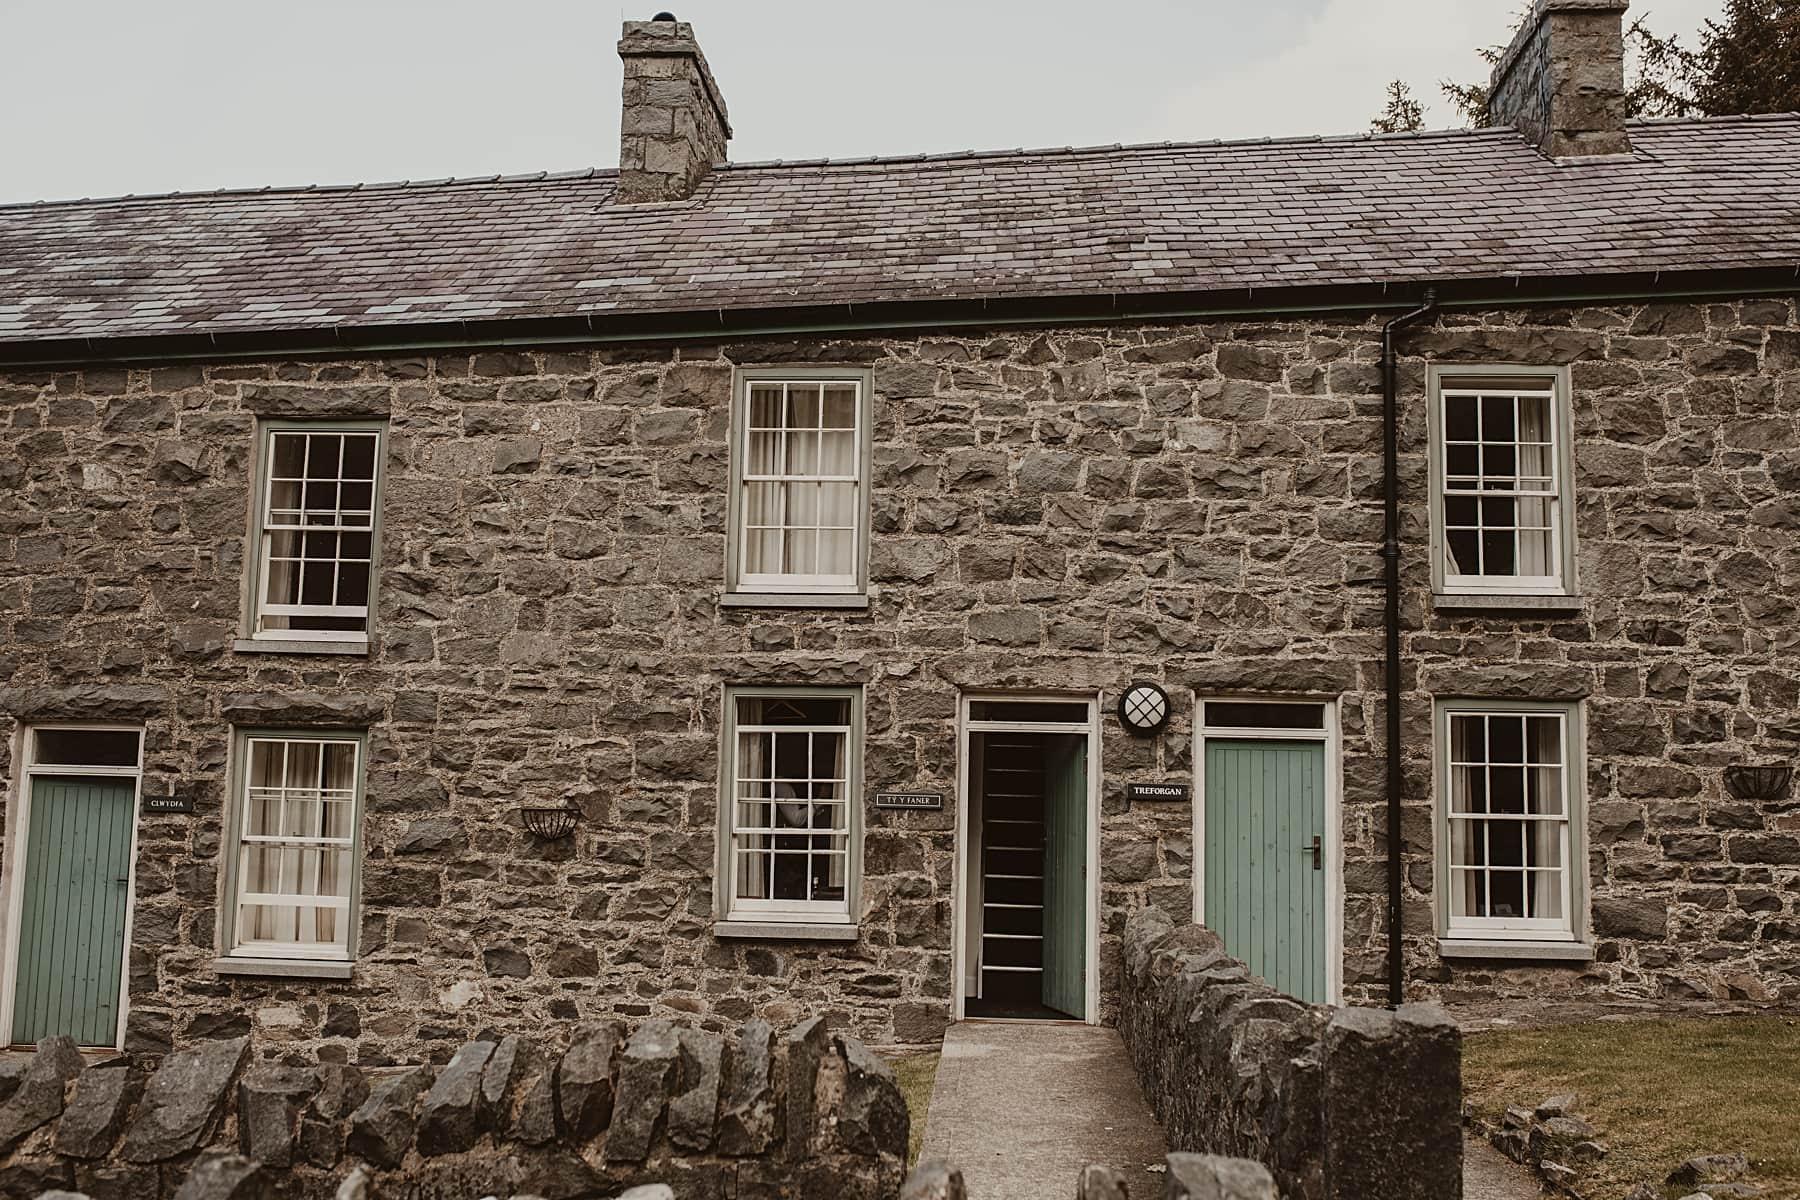 Cottages at Nant Gwrtheyrn